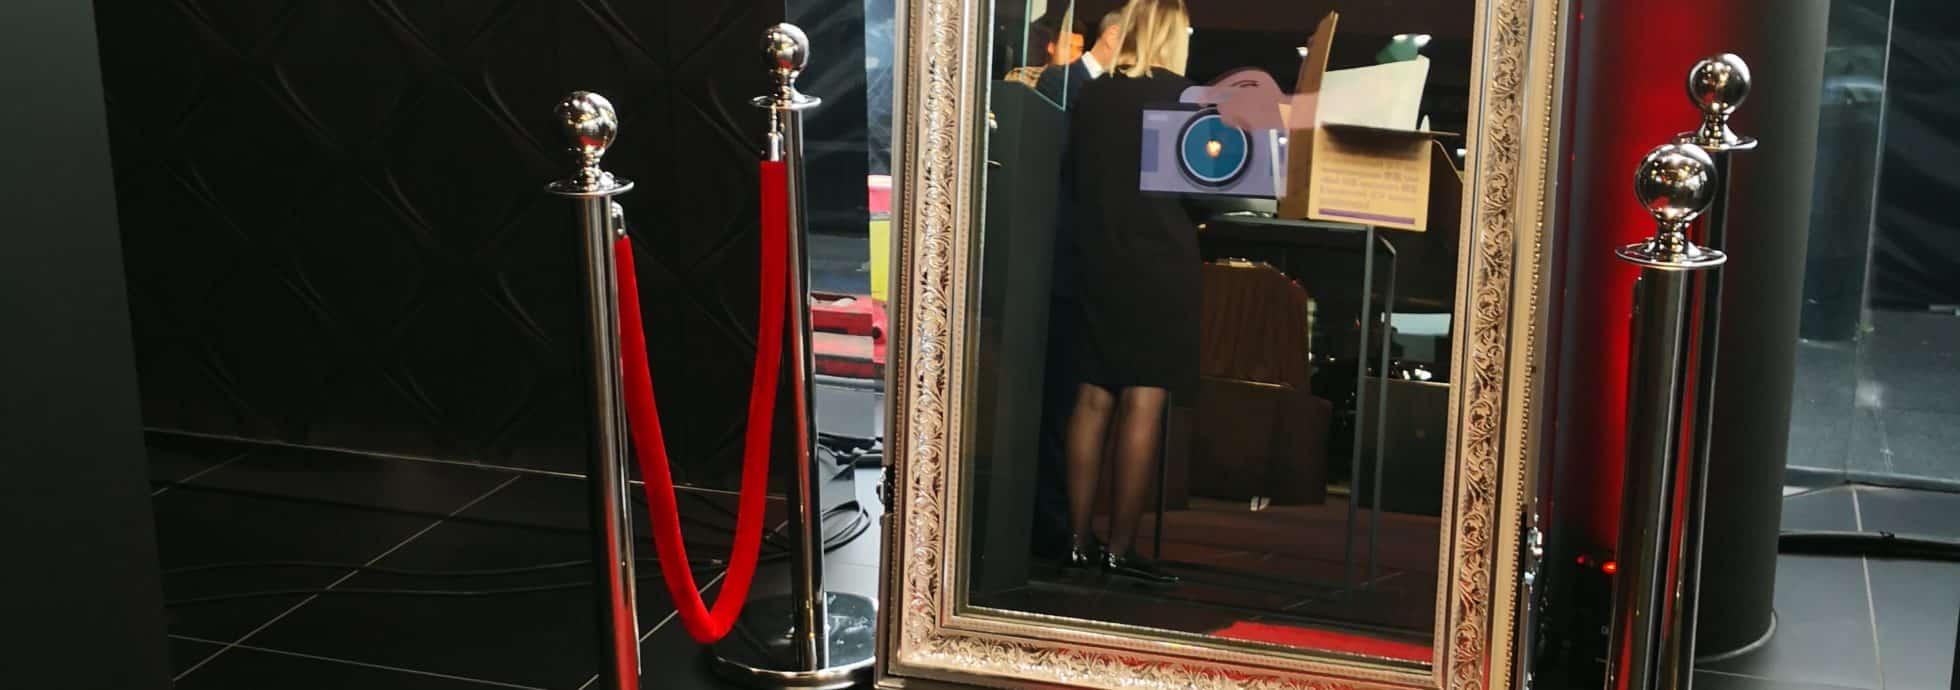 Mirroir magique photobooth